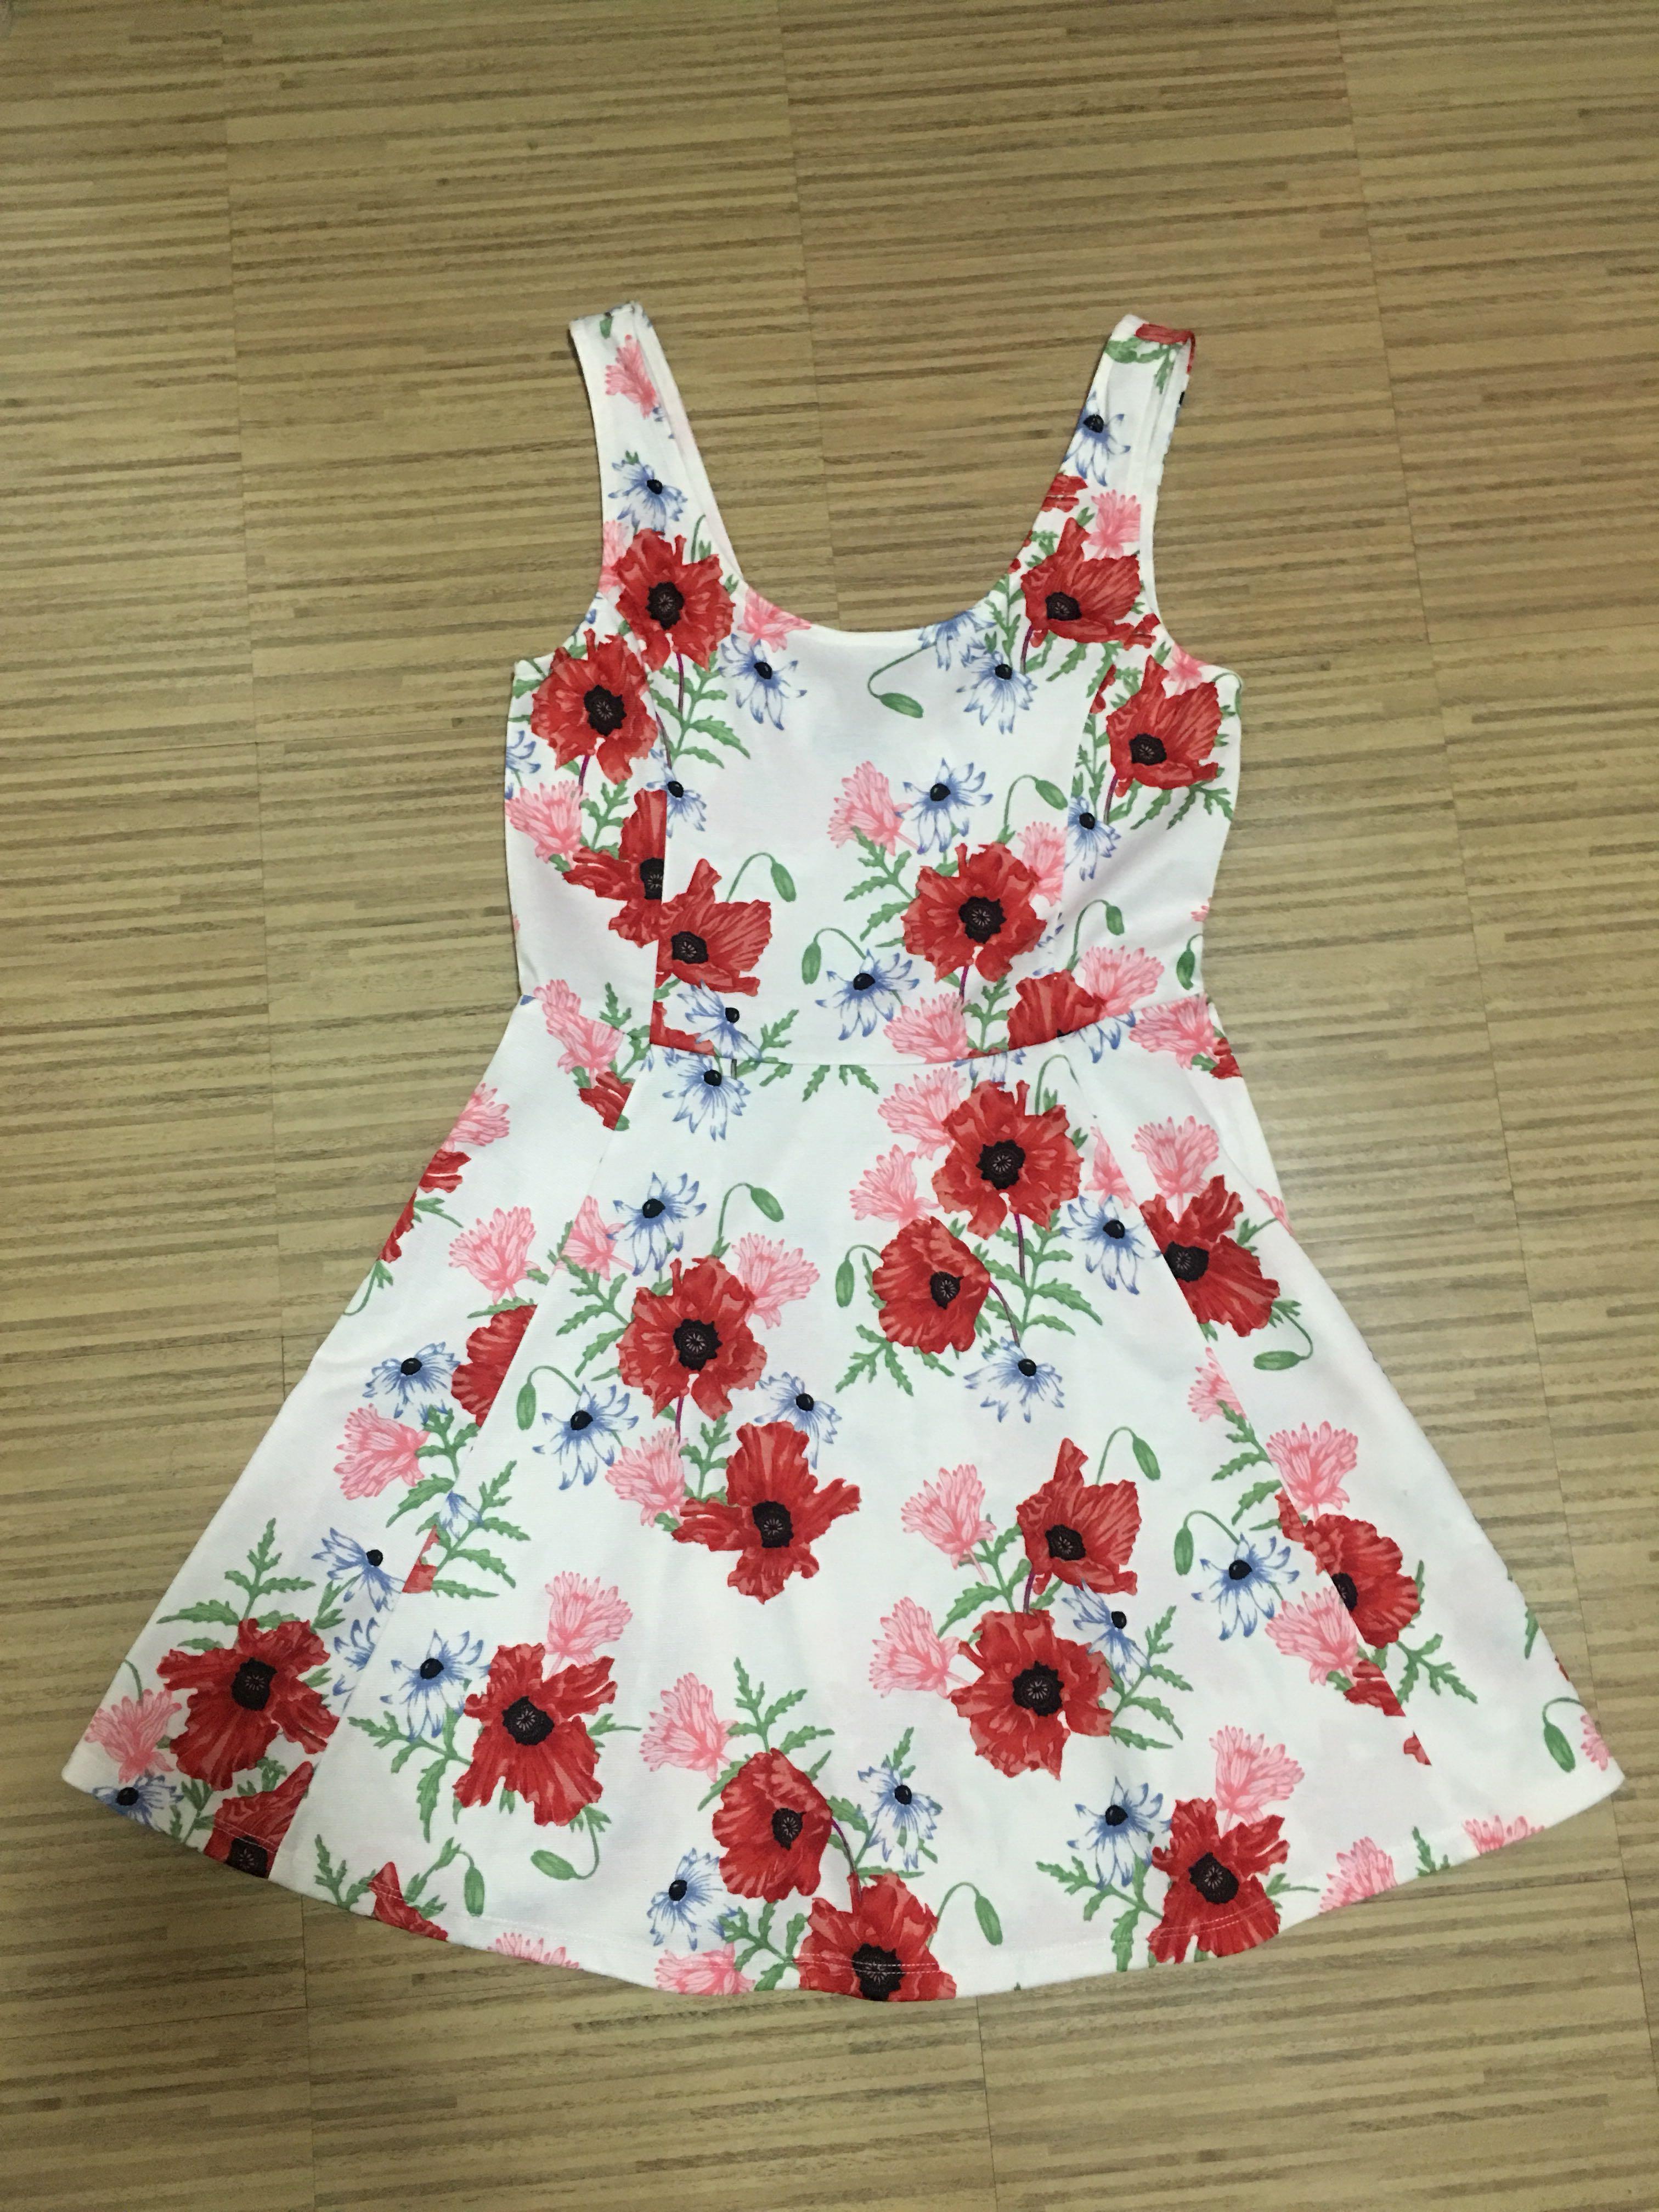 H&M Floral Low Back Dress